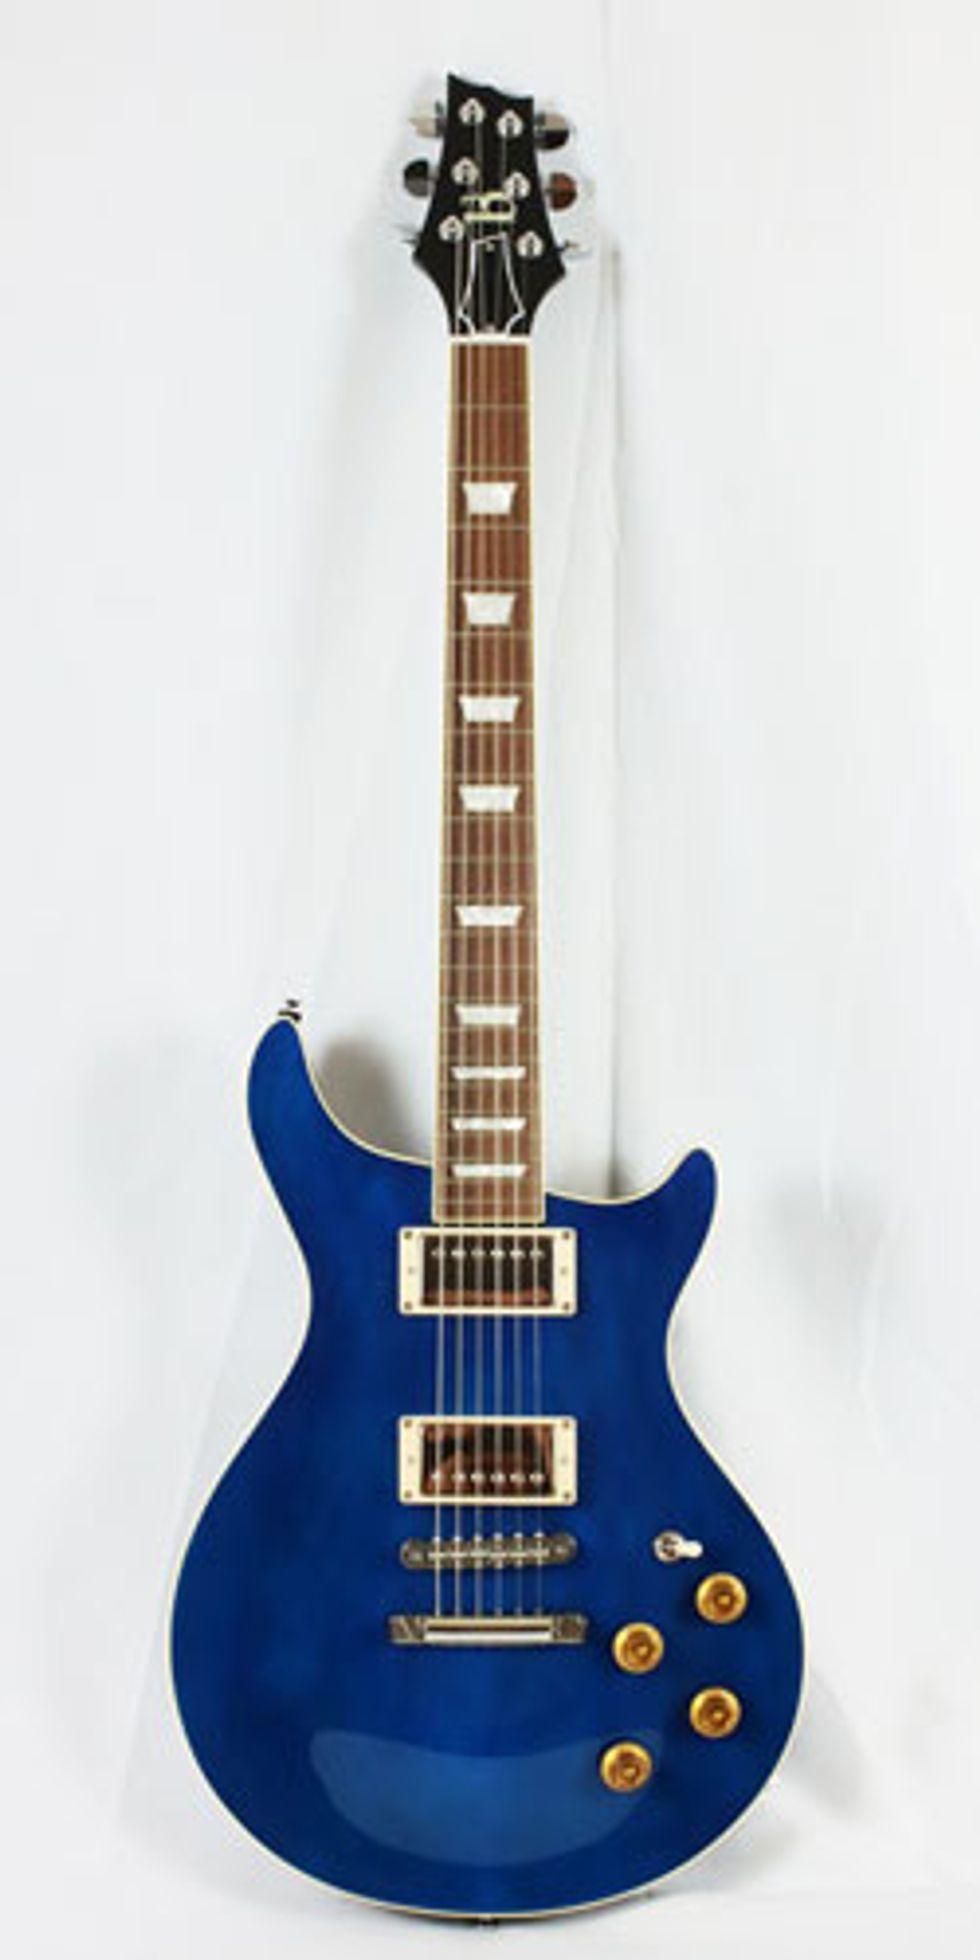 b3 Guitars